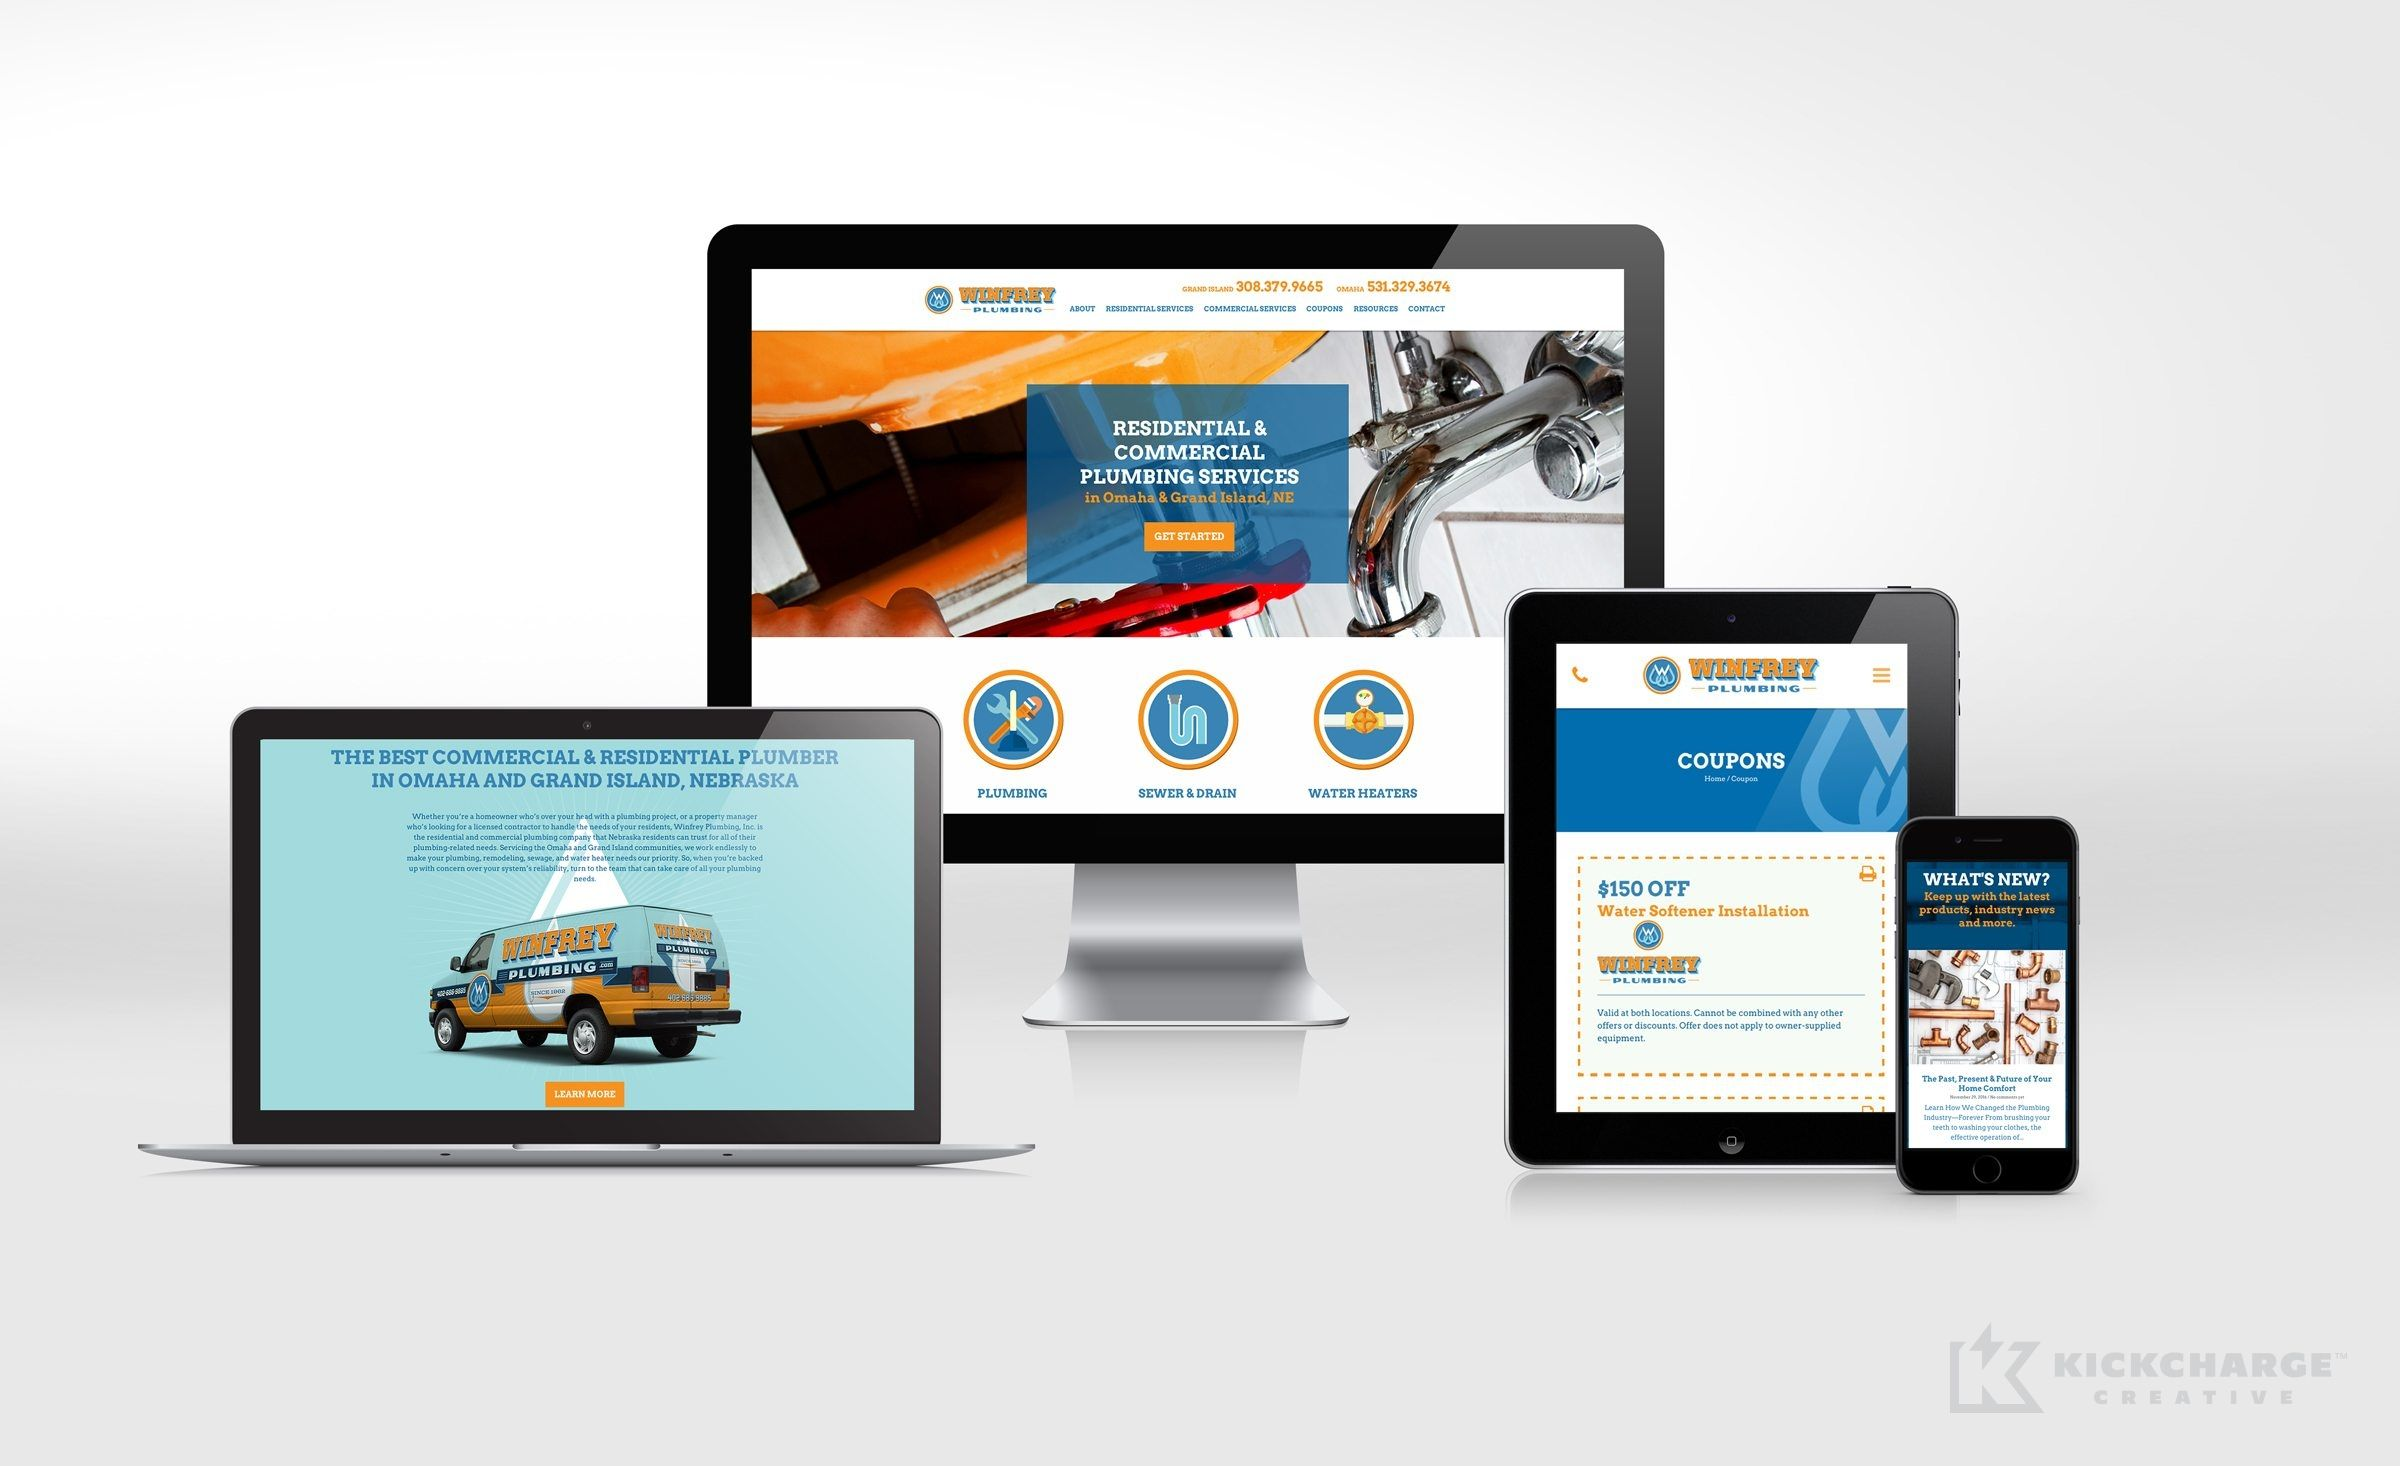 Website Design For Winfrey Plumbing Nj Advertising Agency Nj Ad Agency Nj Web Design Nj Logo Desi Portfolio Web Design Commercial Plumbing Brand Strategy